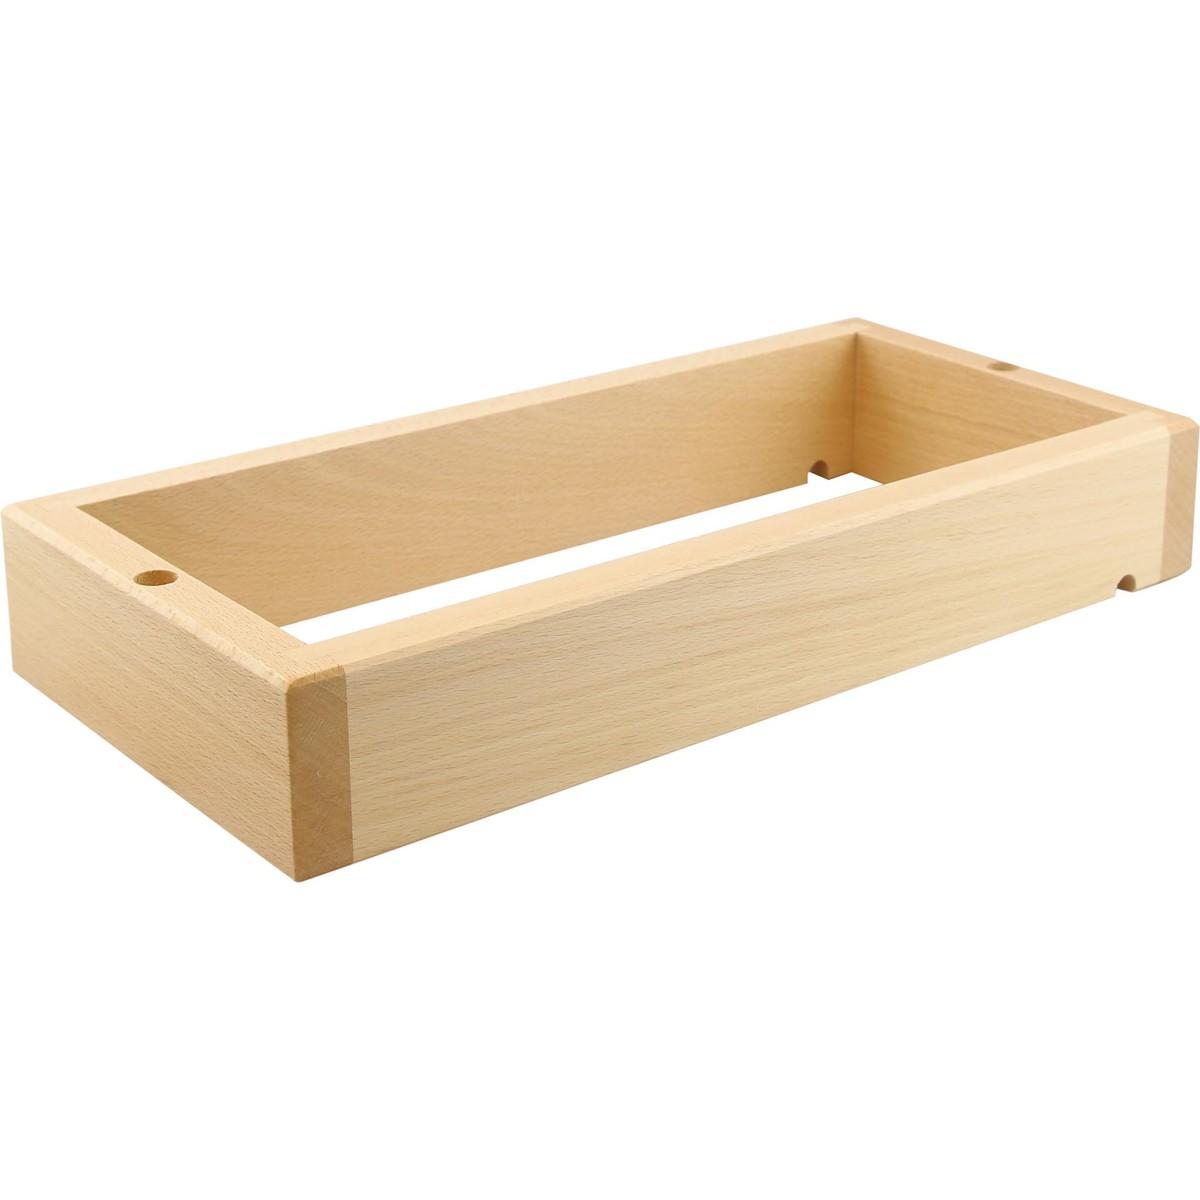 "Buffetsystem ""Wood"" GN 1/3  Basisrahmen 40,5x19x6,5cm stapelbar"